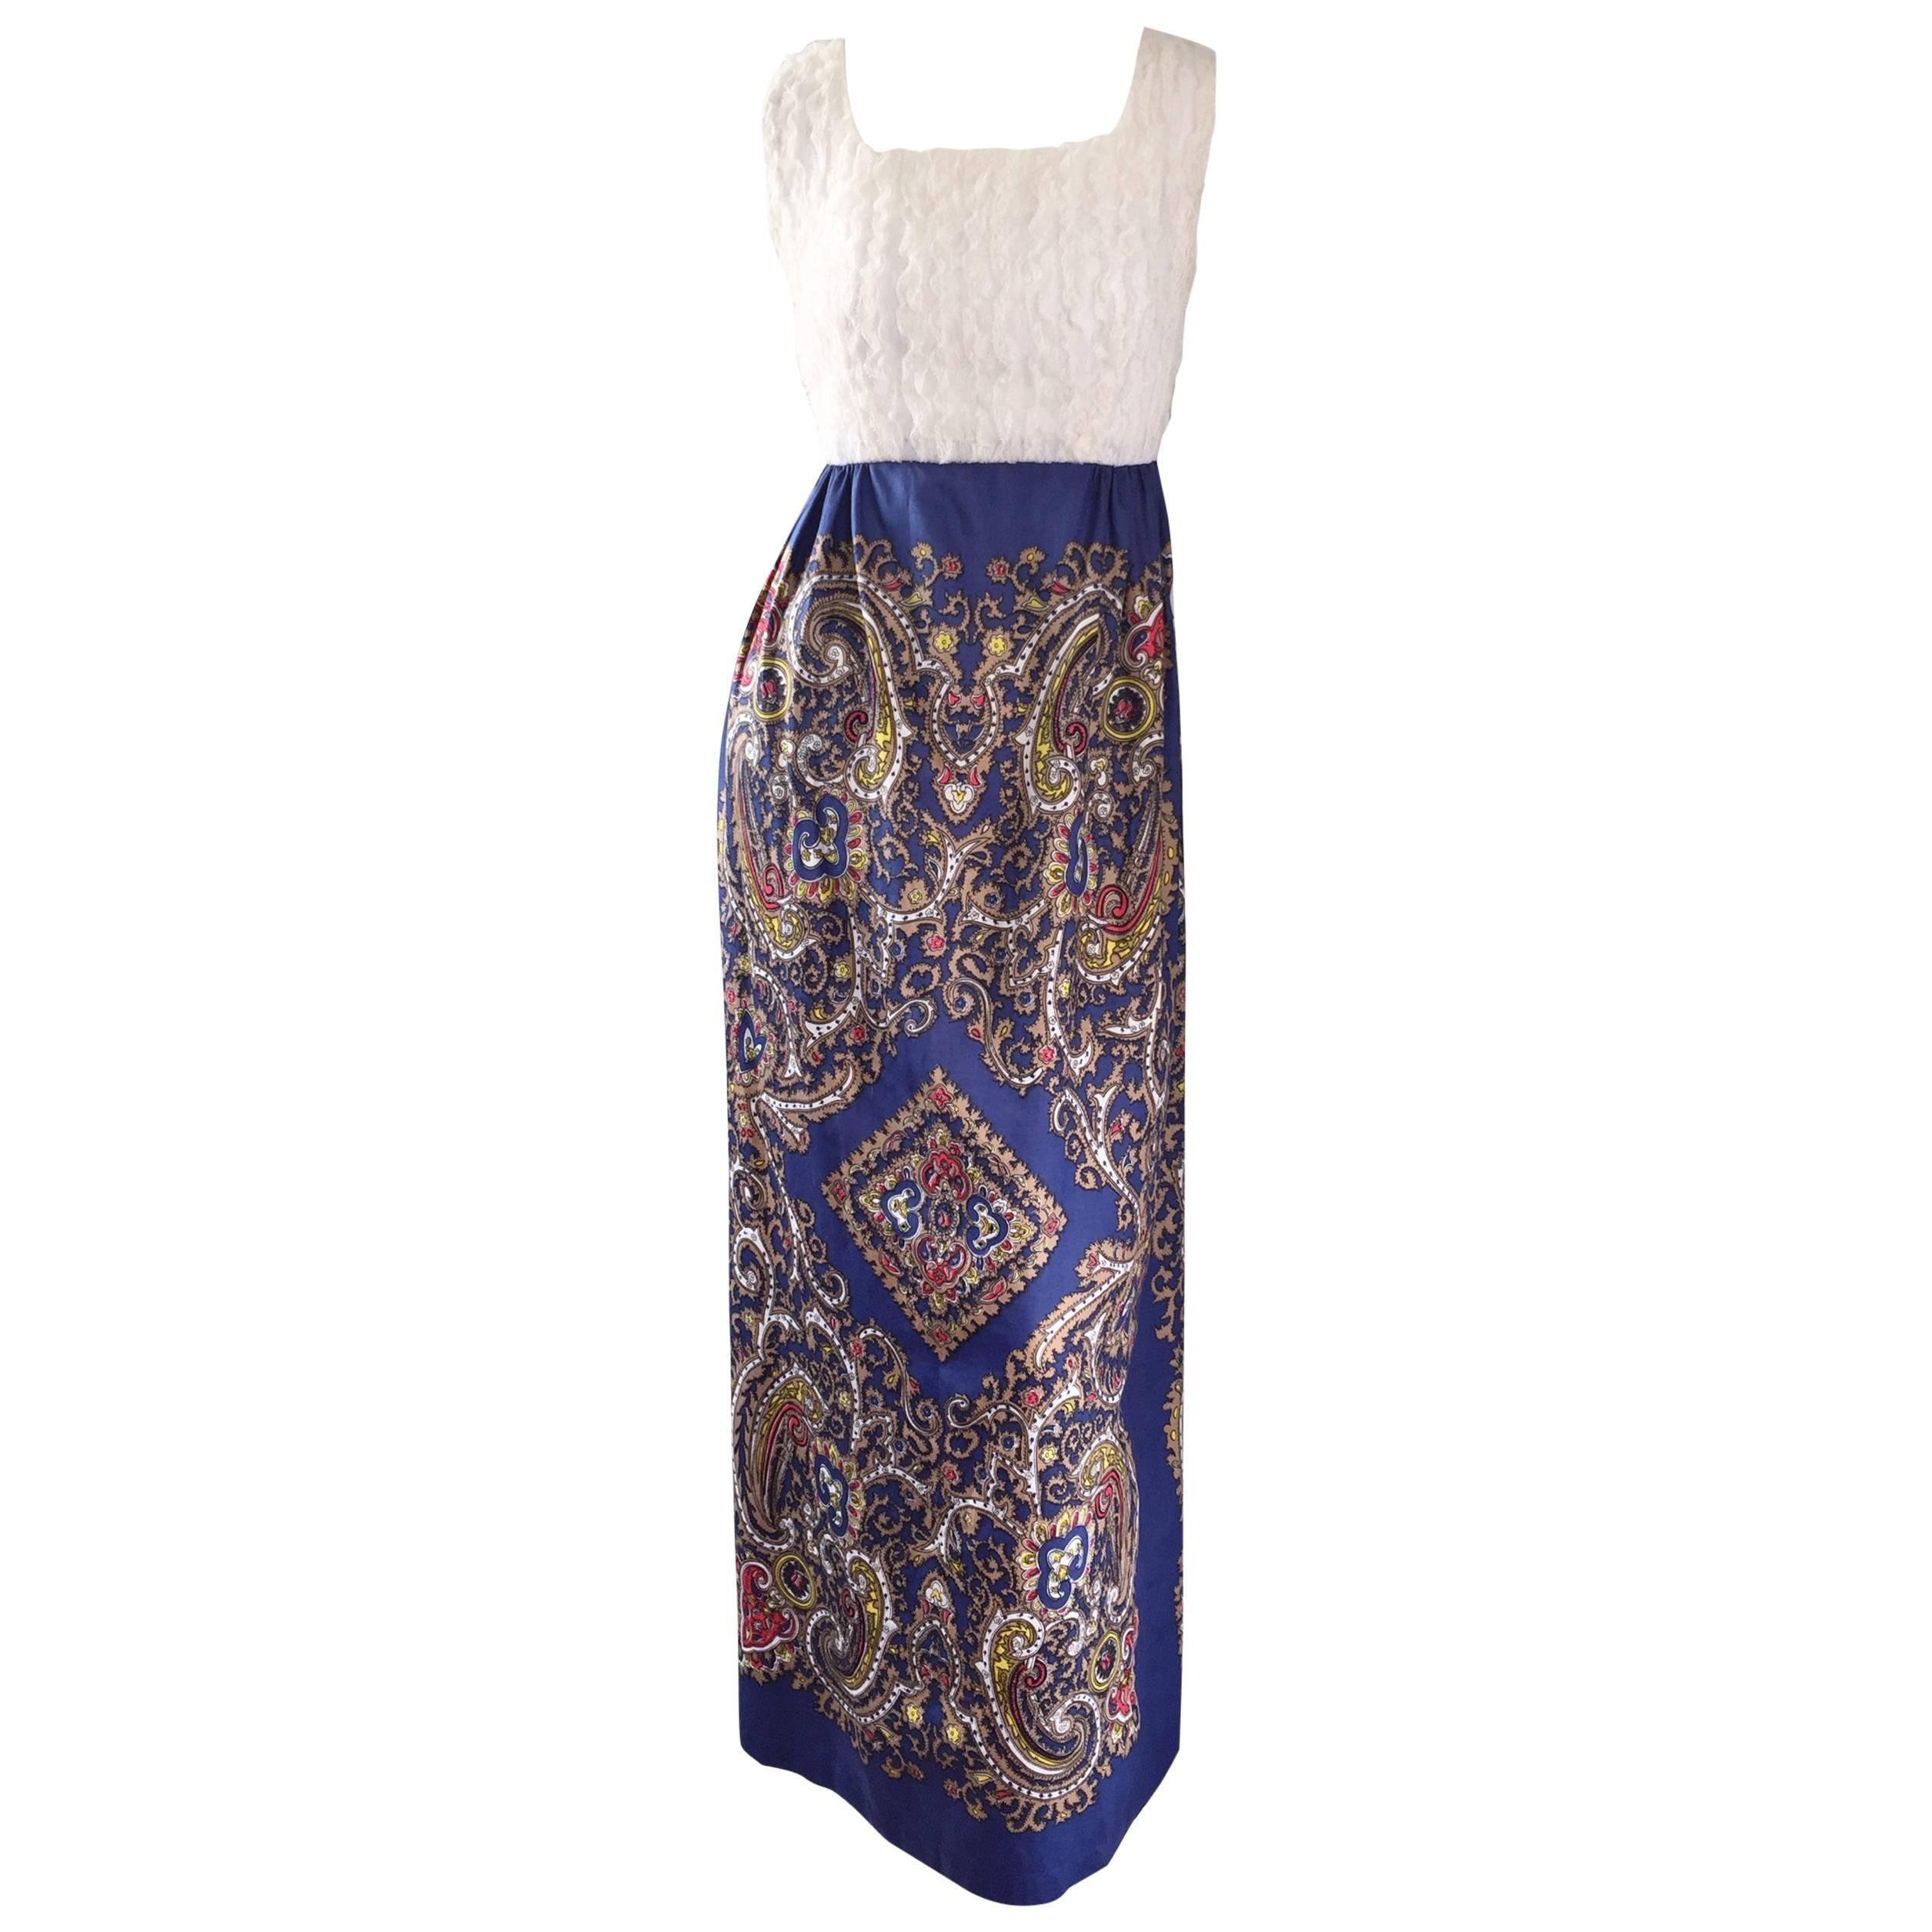 1970s White Silk Lace + Blue Cotton Intricate Paisley Jewel Boho 70s Maxi Dress